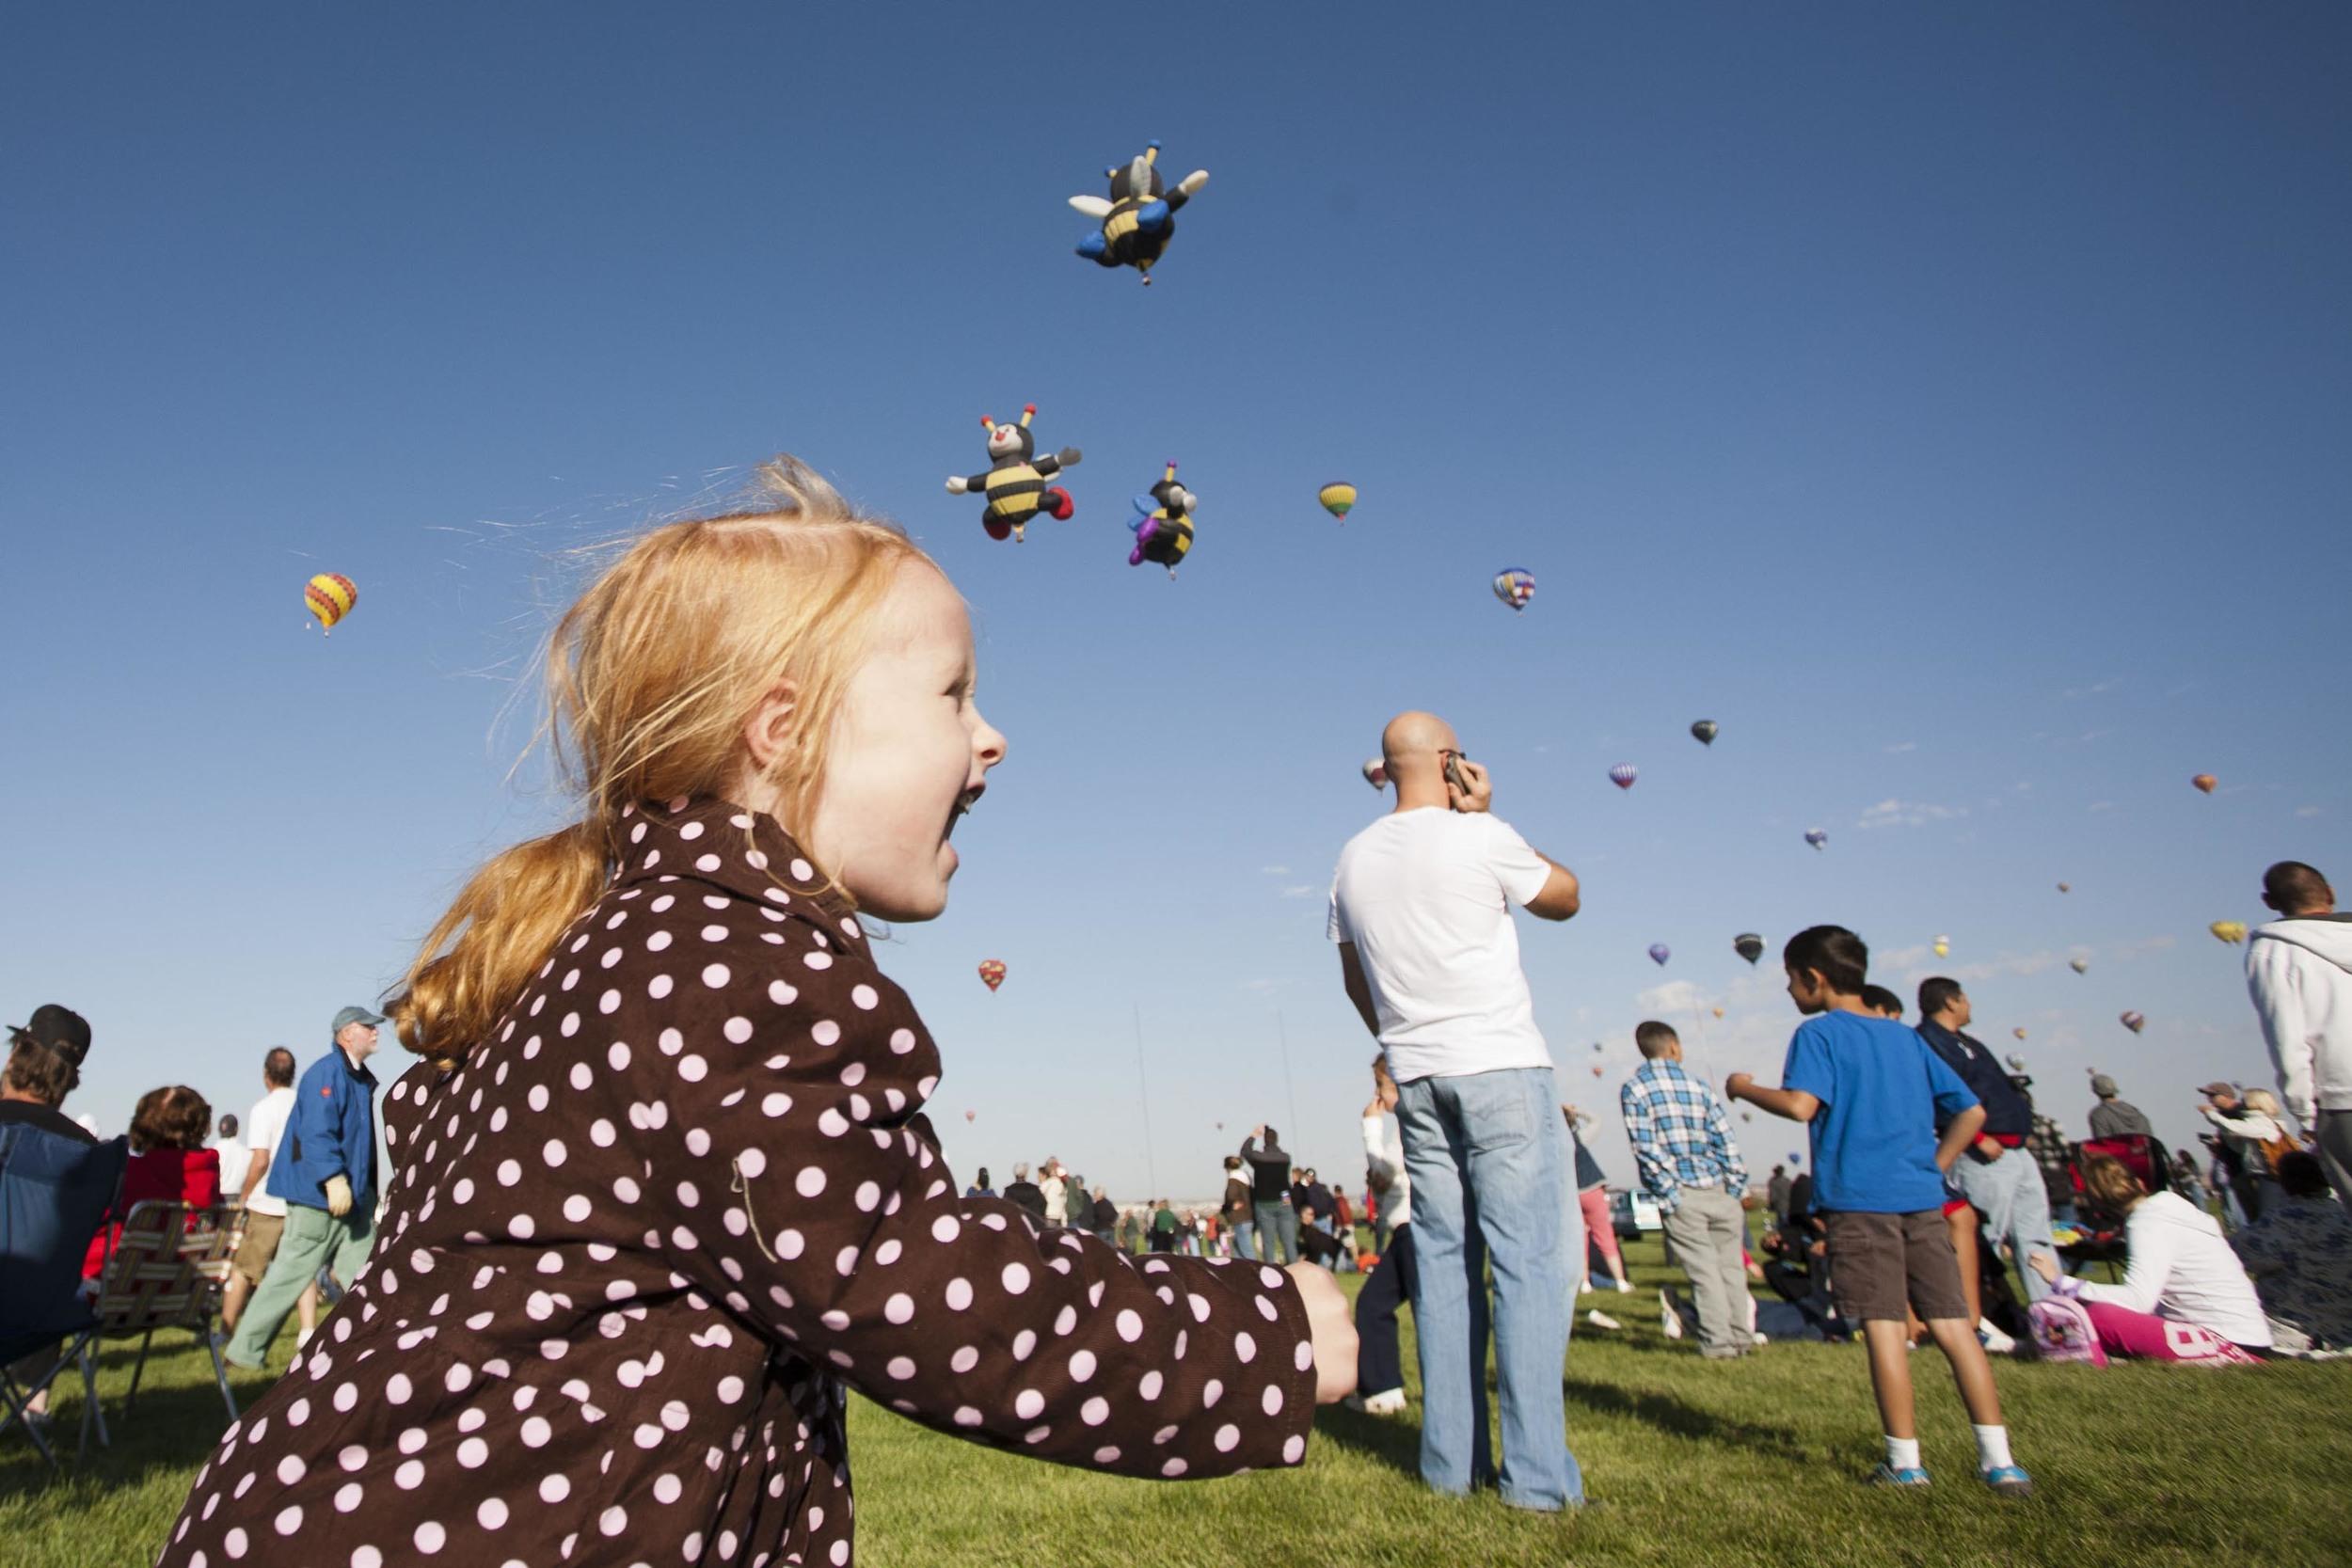 Balloon_Fiesta_girl.jpg